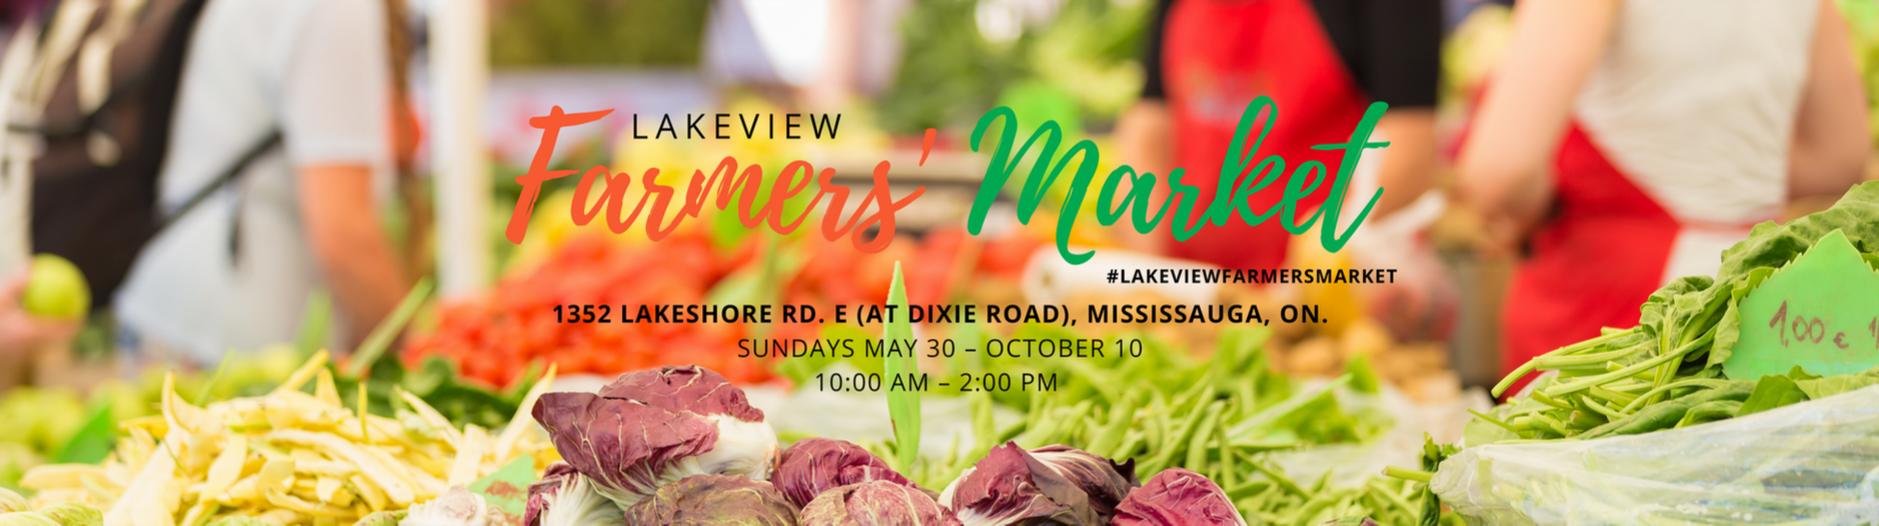 Lakeview Farmers' Market